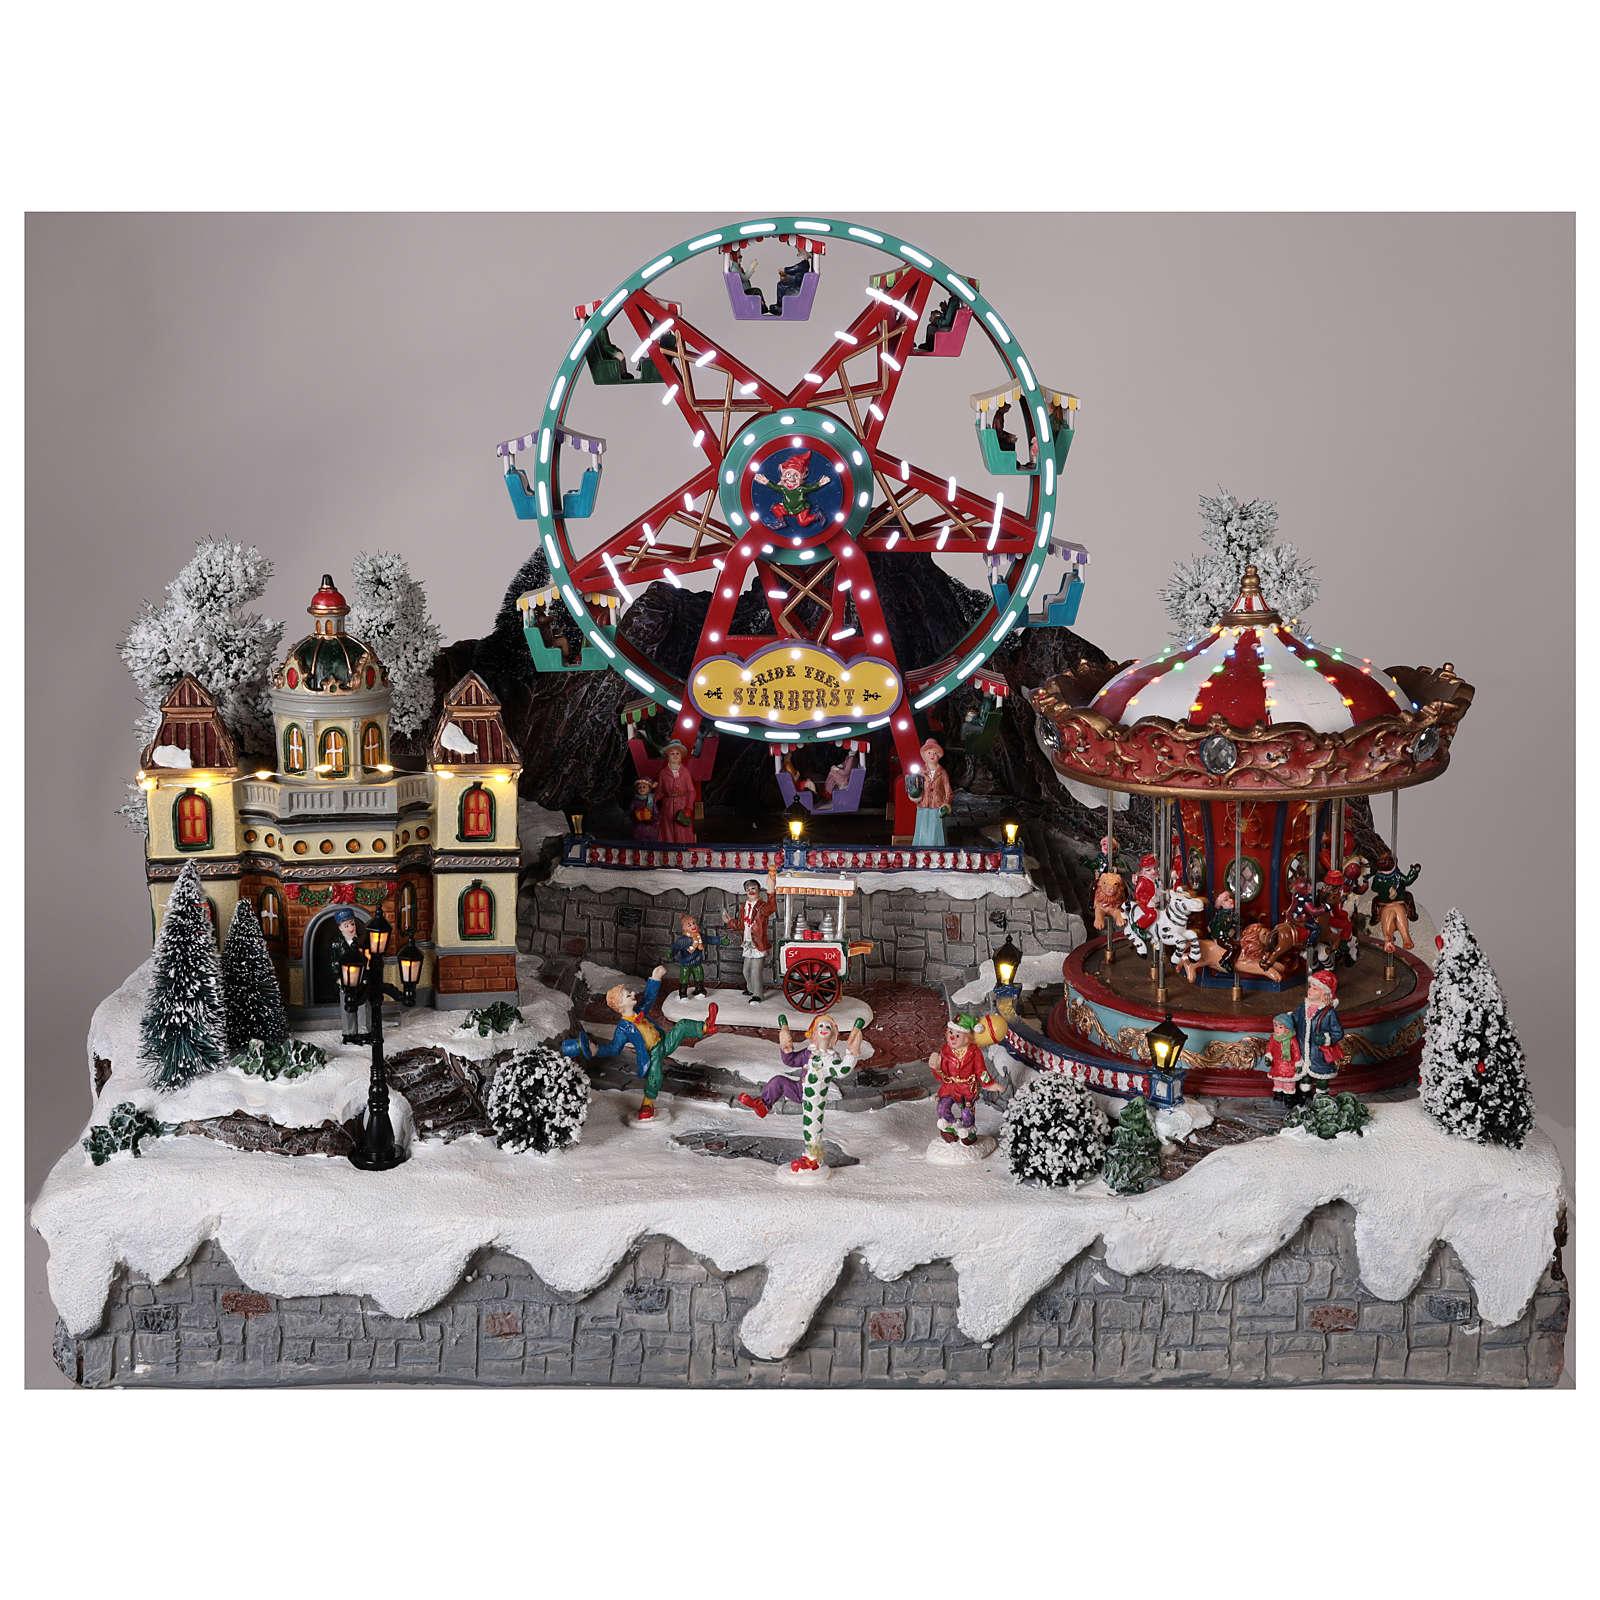 Pueblo navideño noria tiovivo movimiento luces 50x50x45 cm 3